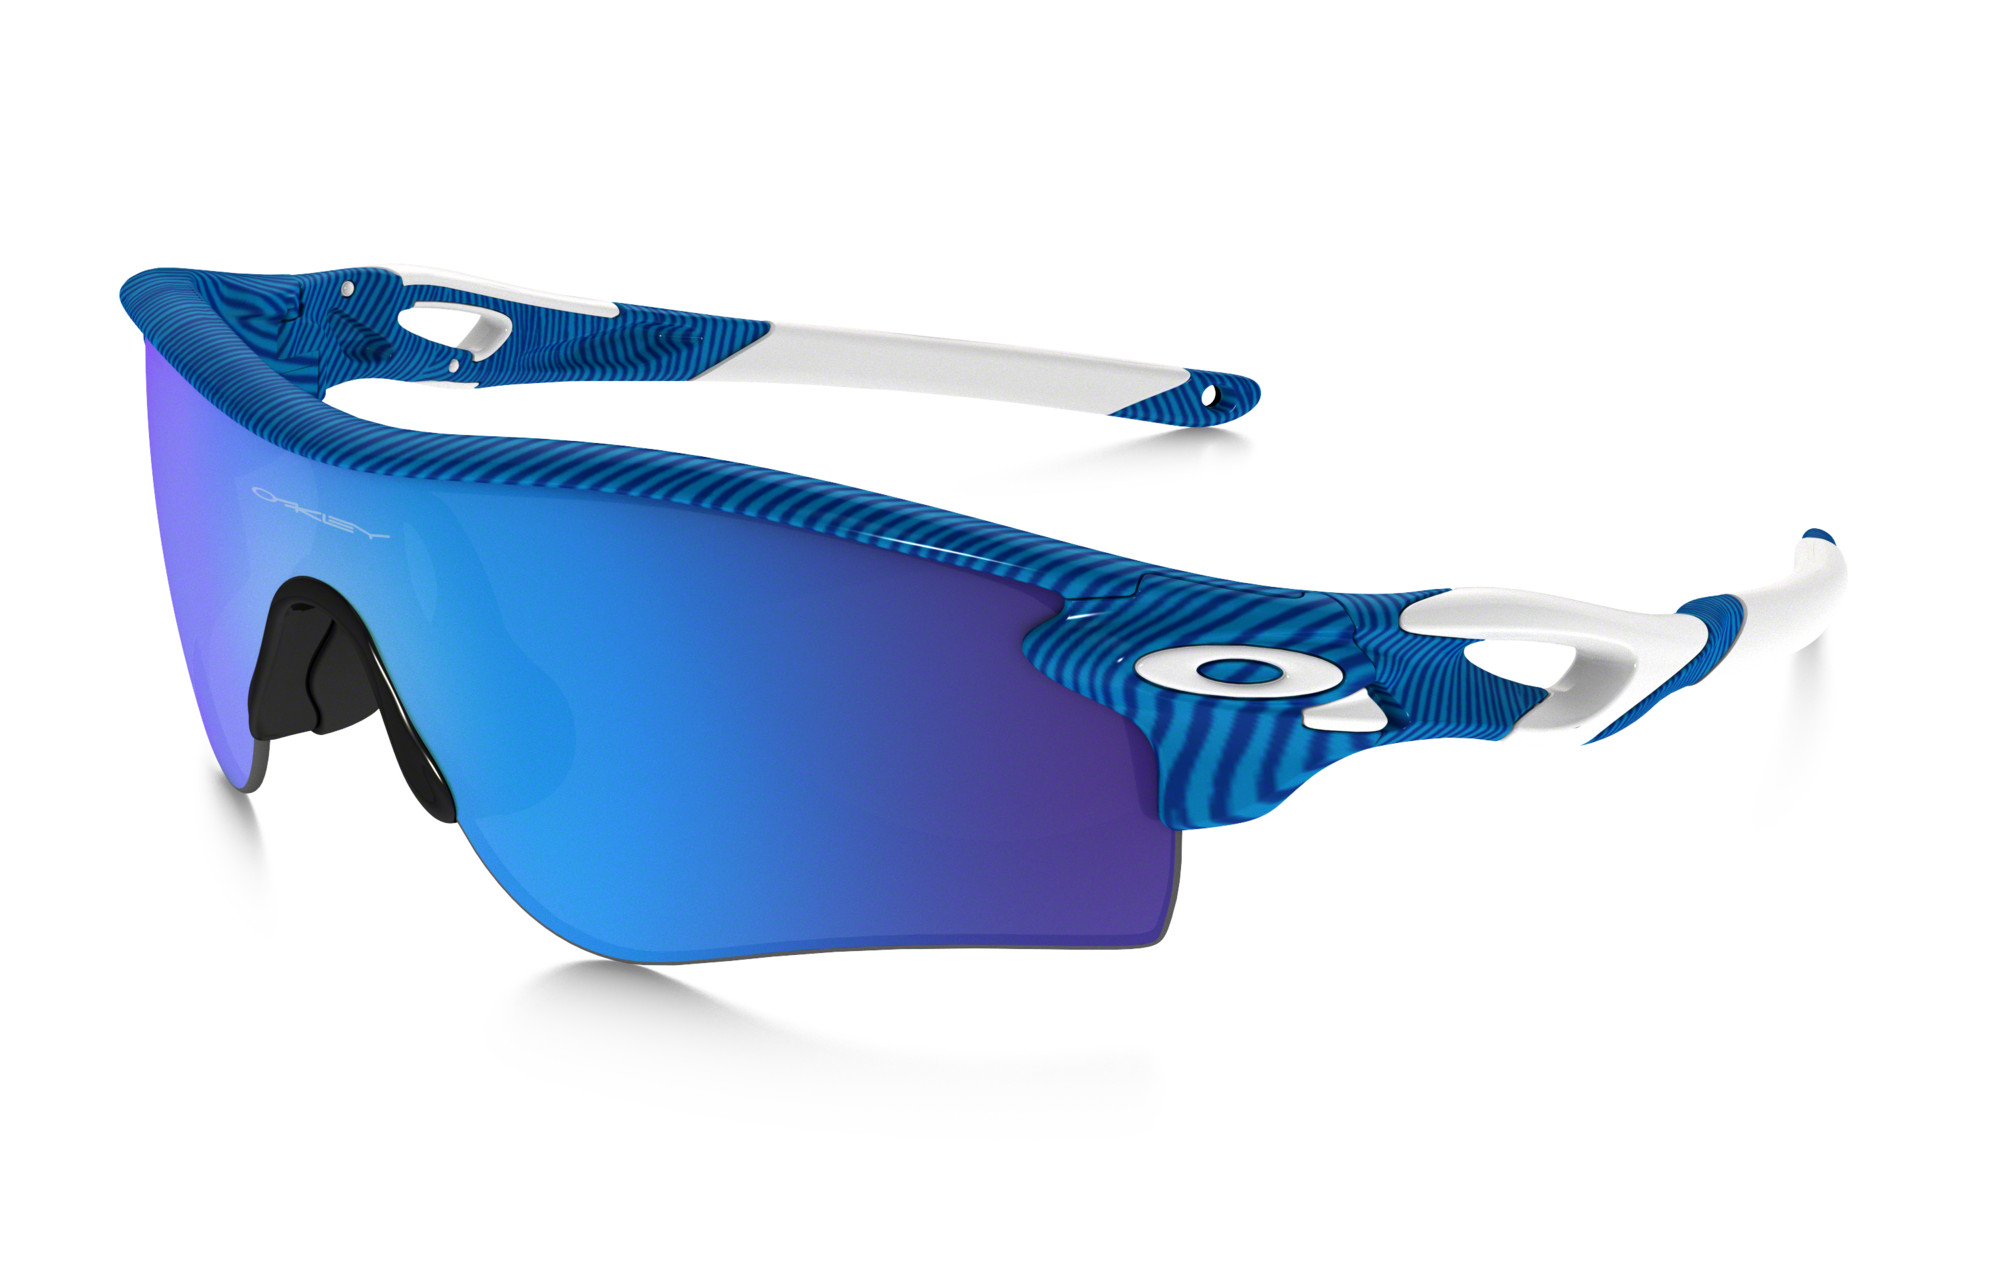 OAKLEY Paire de lunettes FINGERPRINT RADARLOCK PATH Bleu Sapphire Iridium  réf oo9181-46 d93e3ea2459c